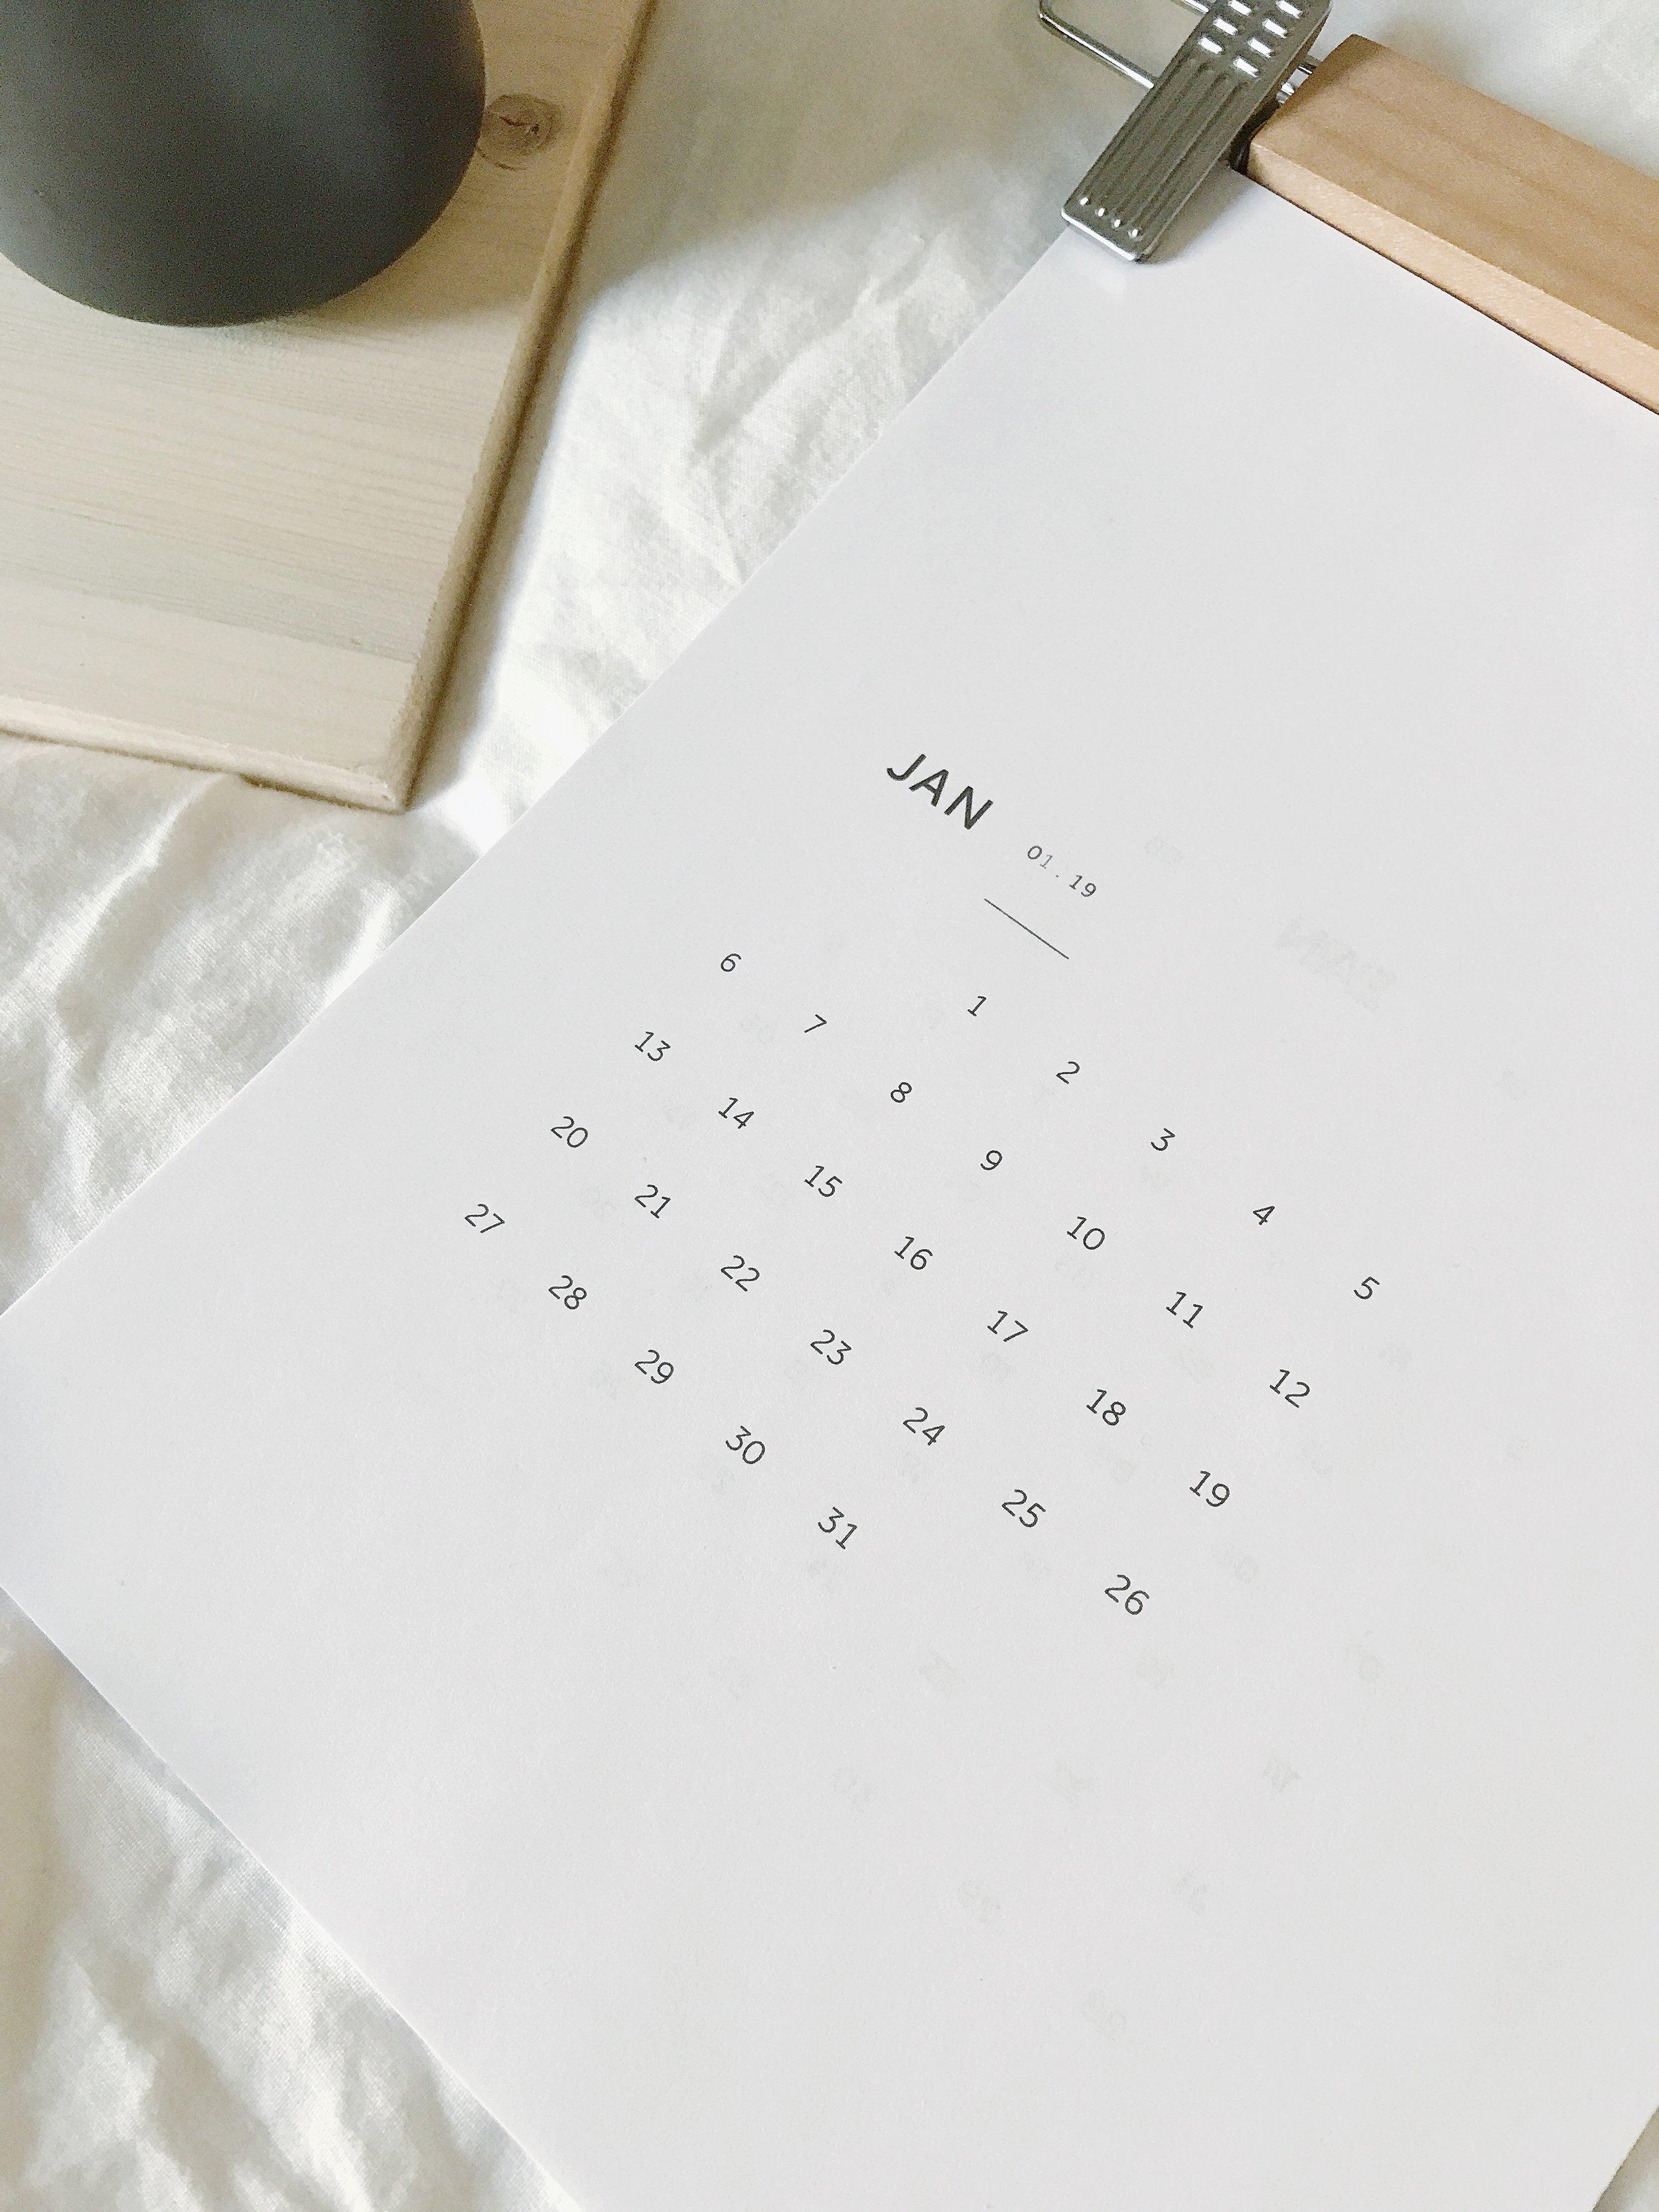 2019 Free Calendar by Lauren Sauder printable calendar, free download calendar, desk calendar, 2019 calendar, monthly calendar, new year calendar